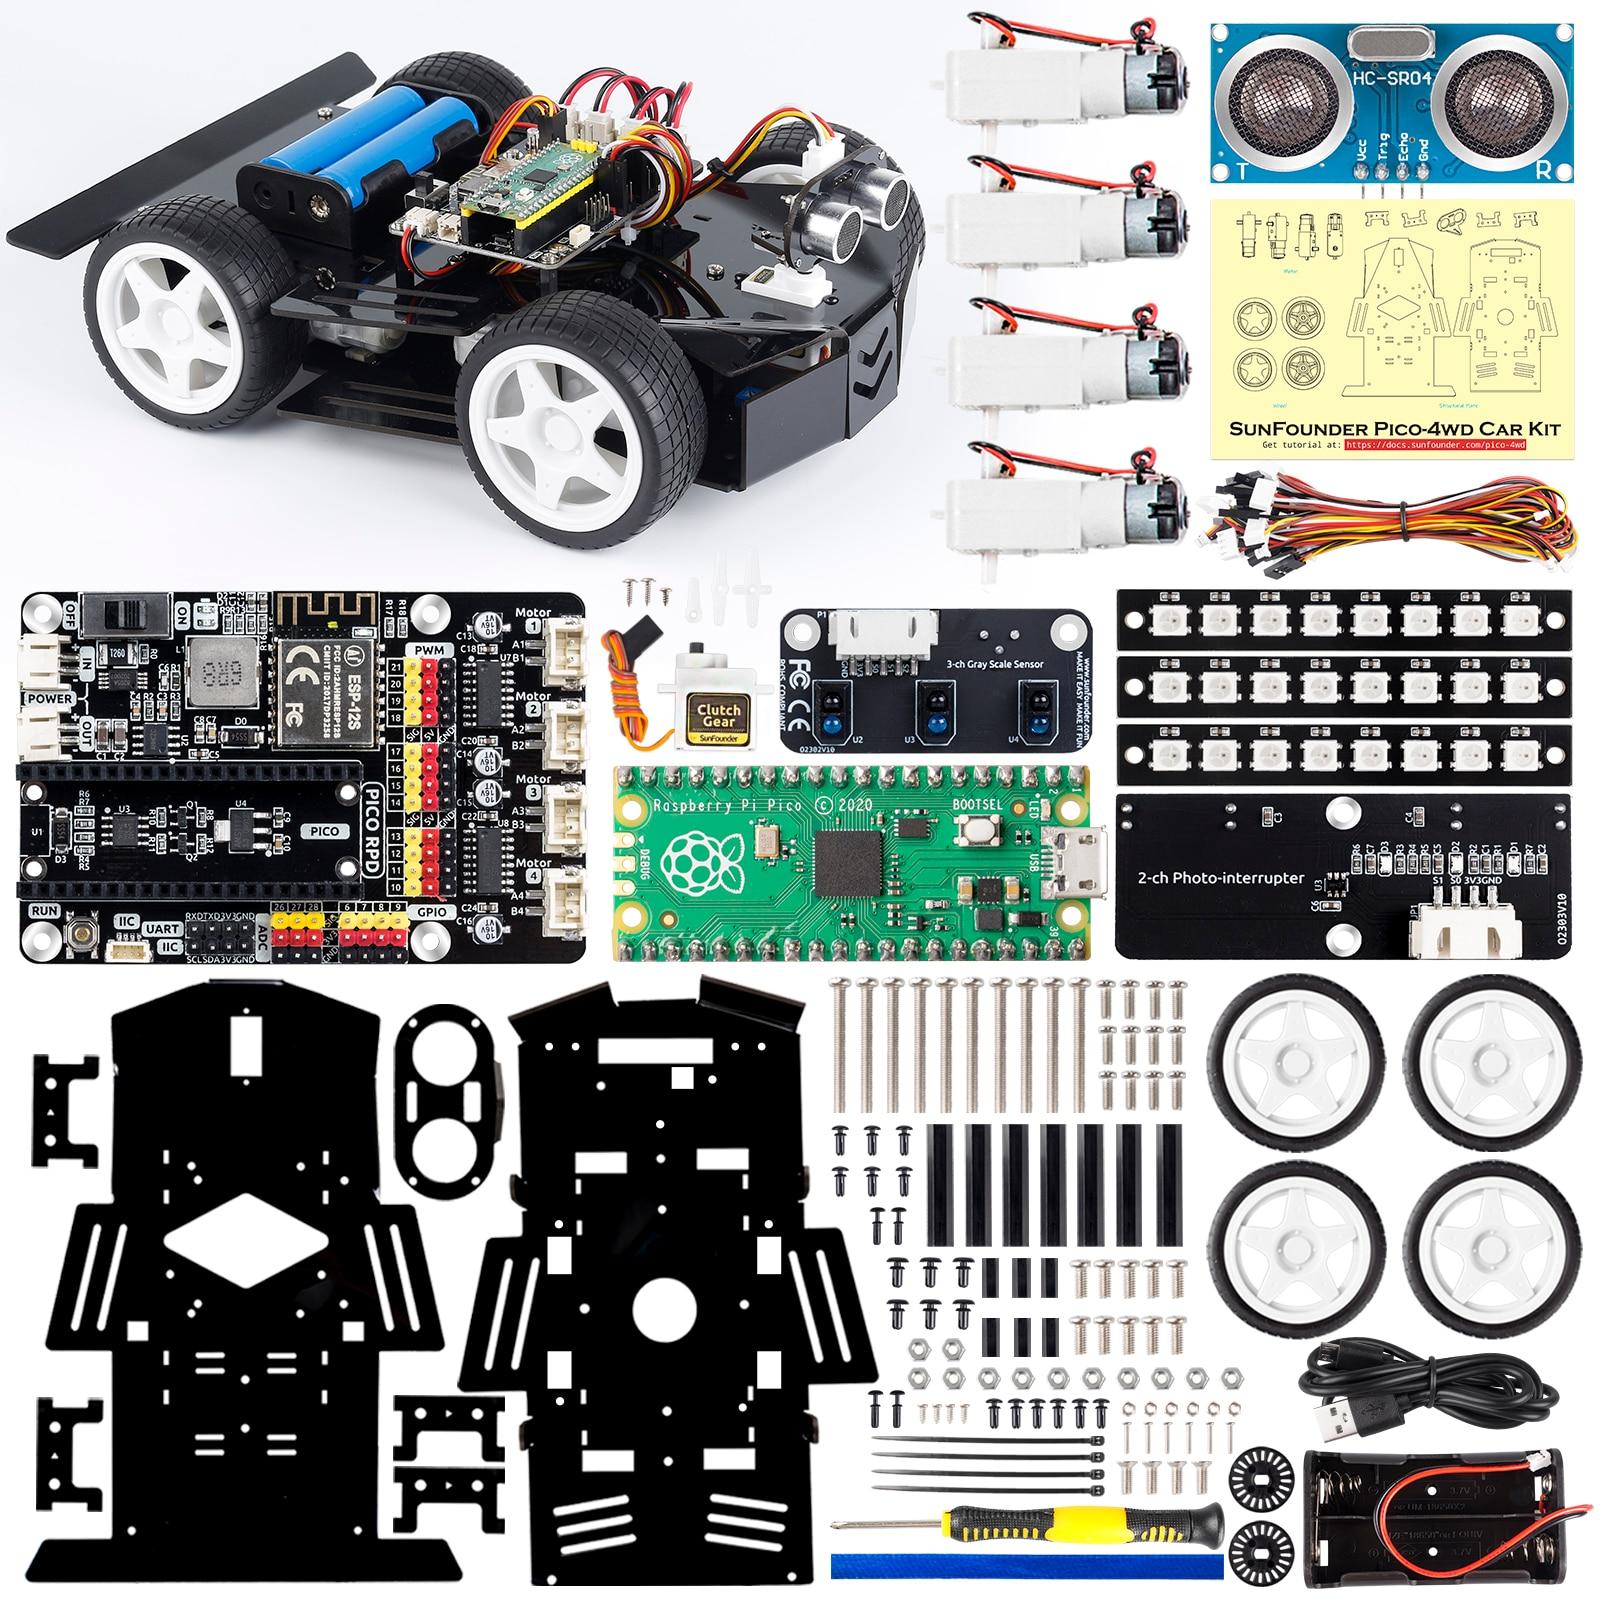 SUNFOUNDER Raspberry Pi Pico Robot Car Kit, Open Source, MicroPython, App Control